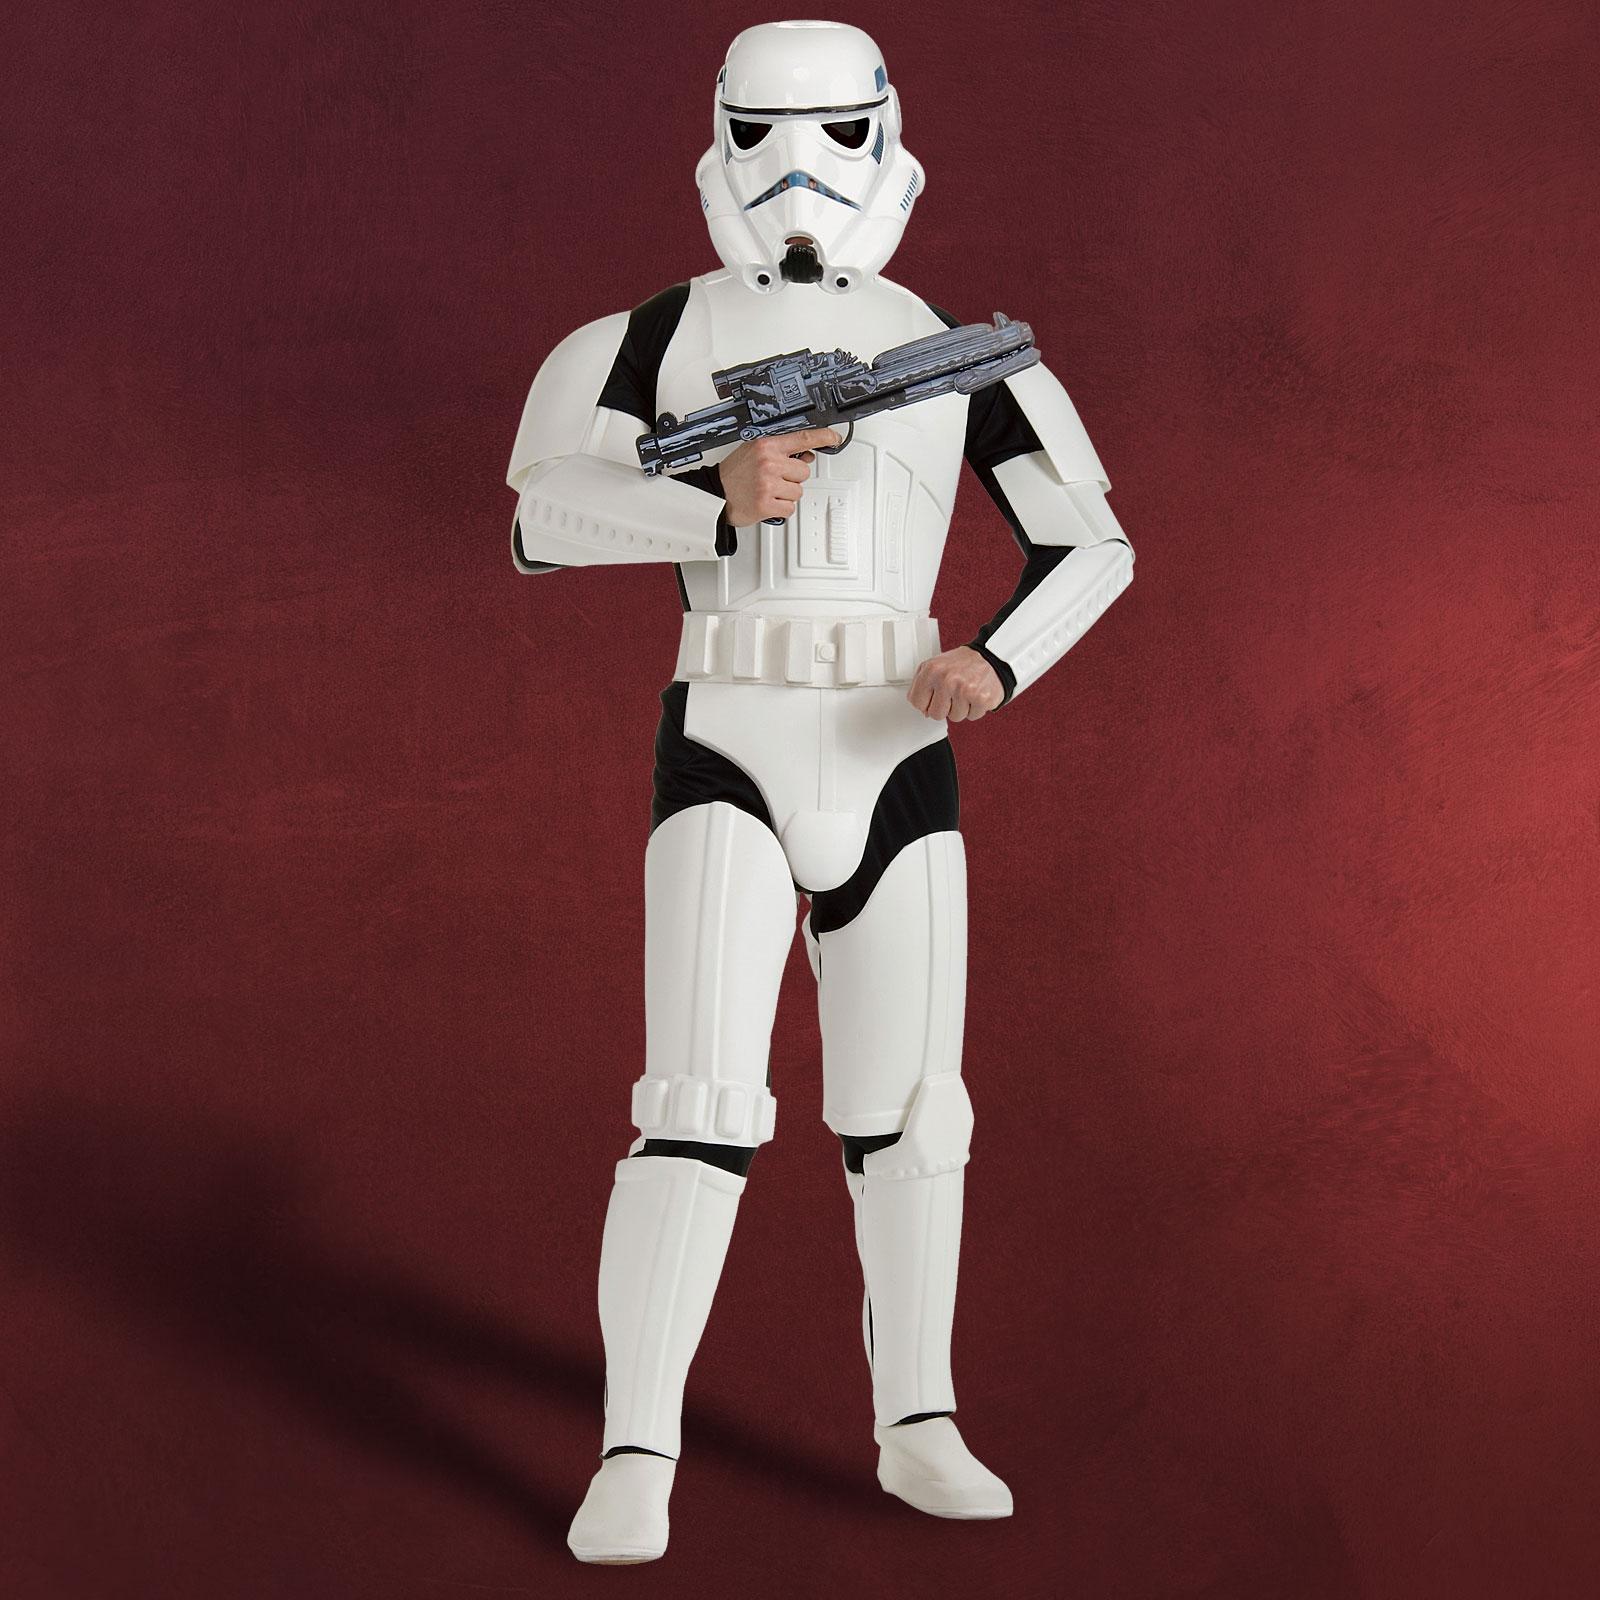 star wars stormtrooper kost m f r erwachsene elbenwald. Black Bedroom Furniture Sets. Home Design Ideas